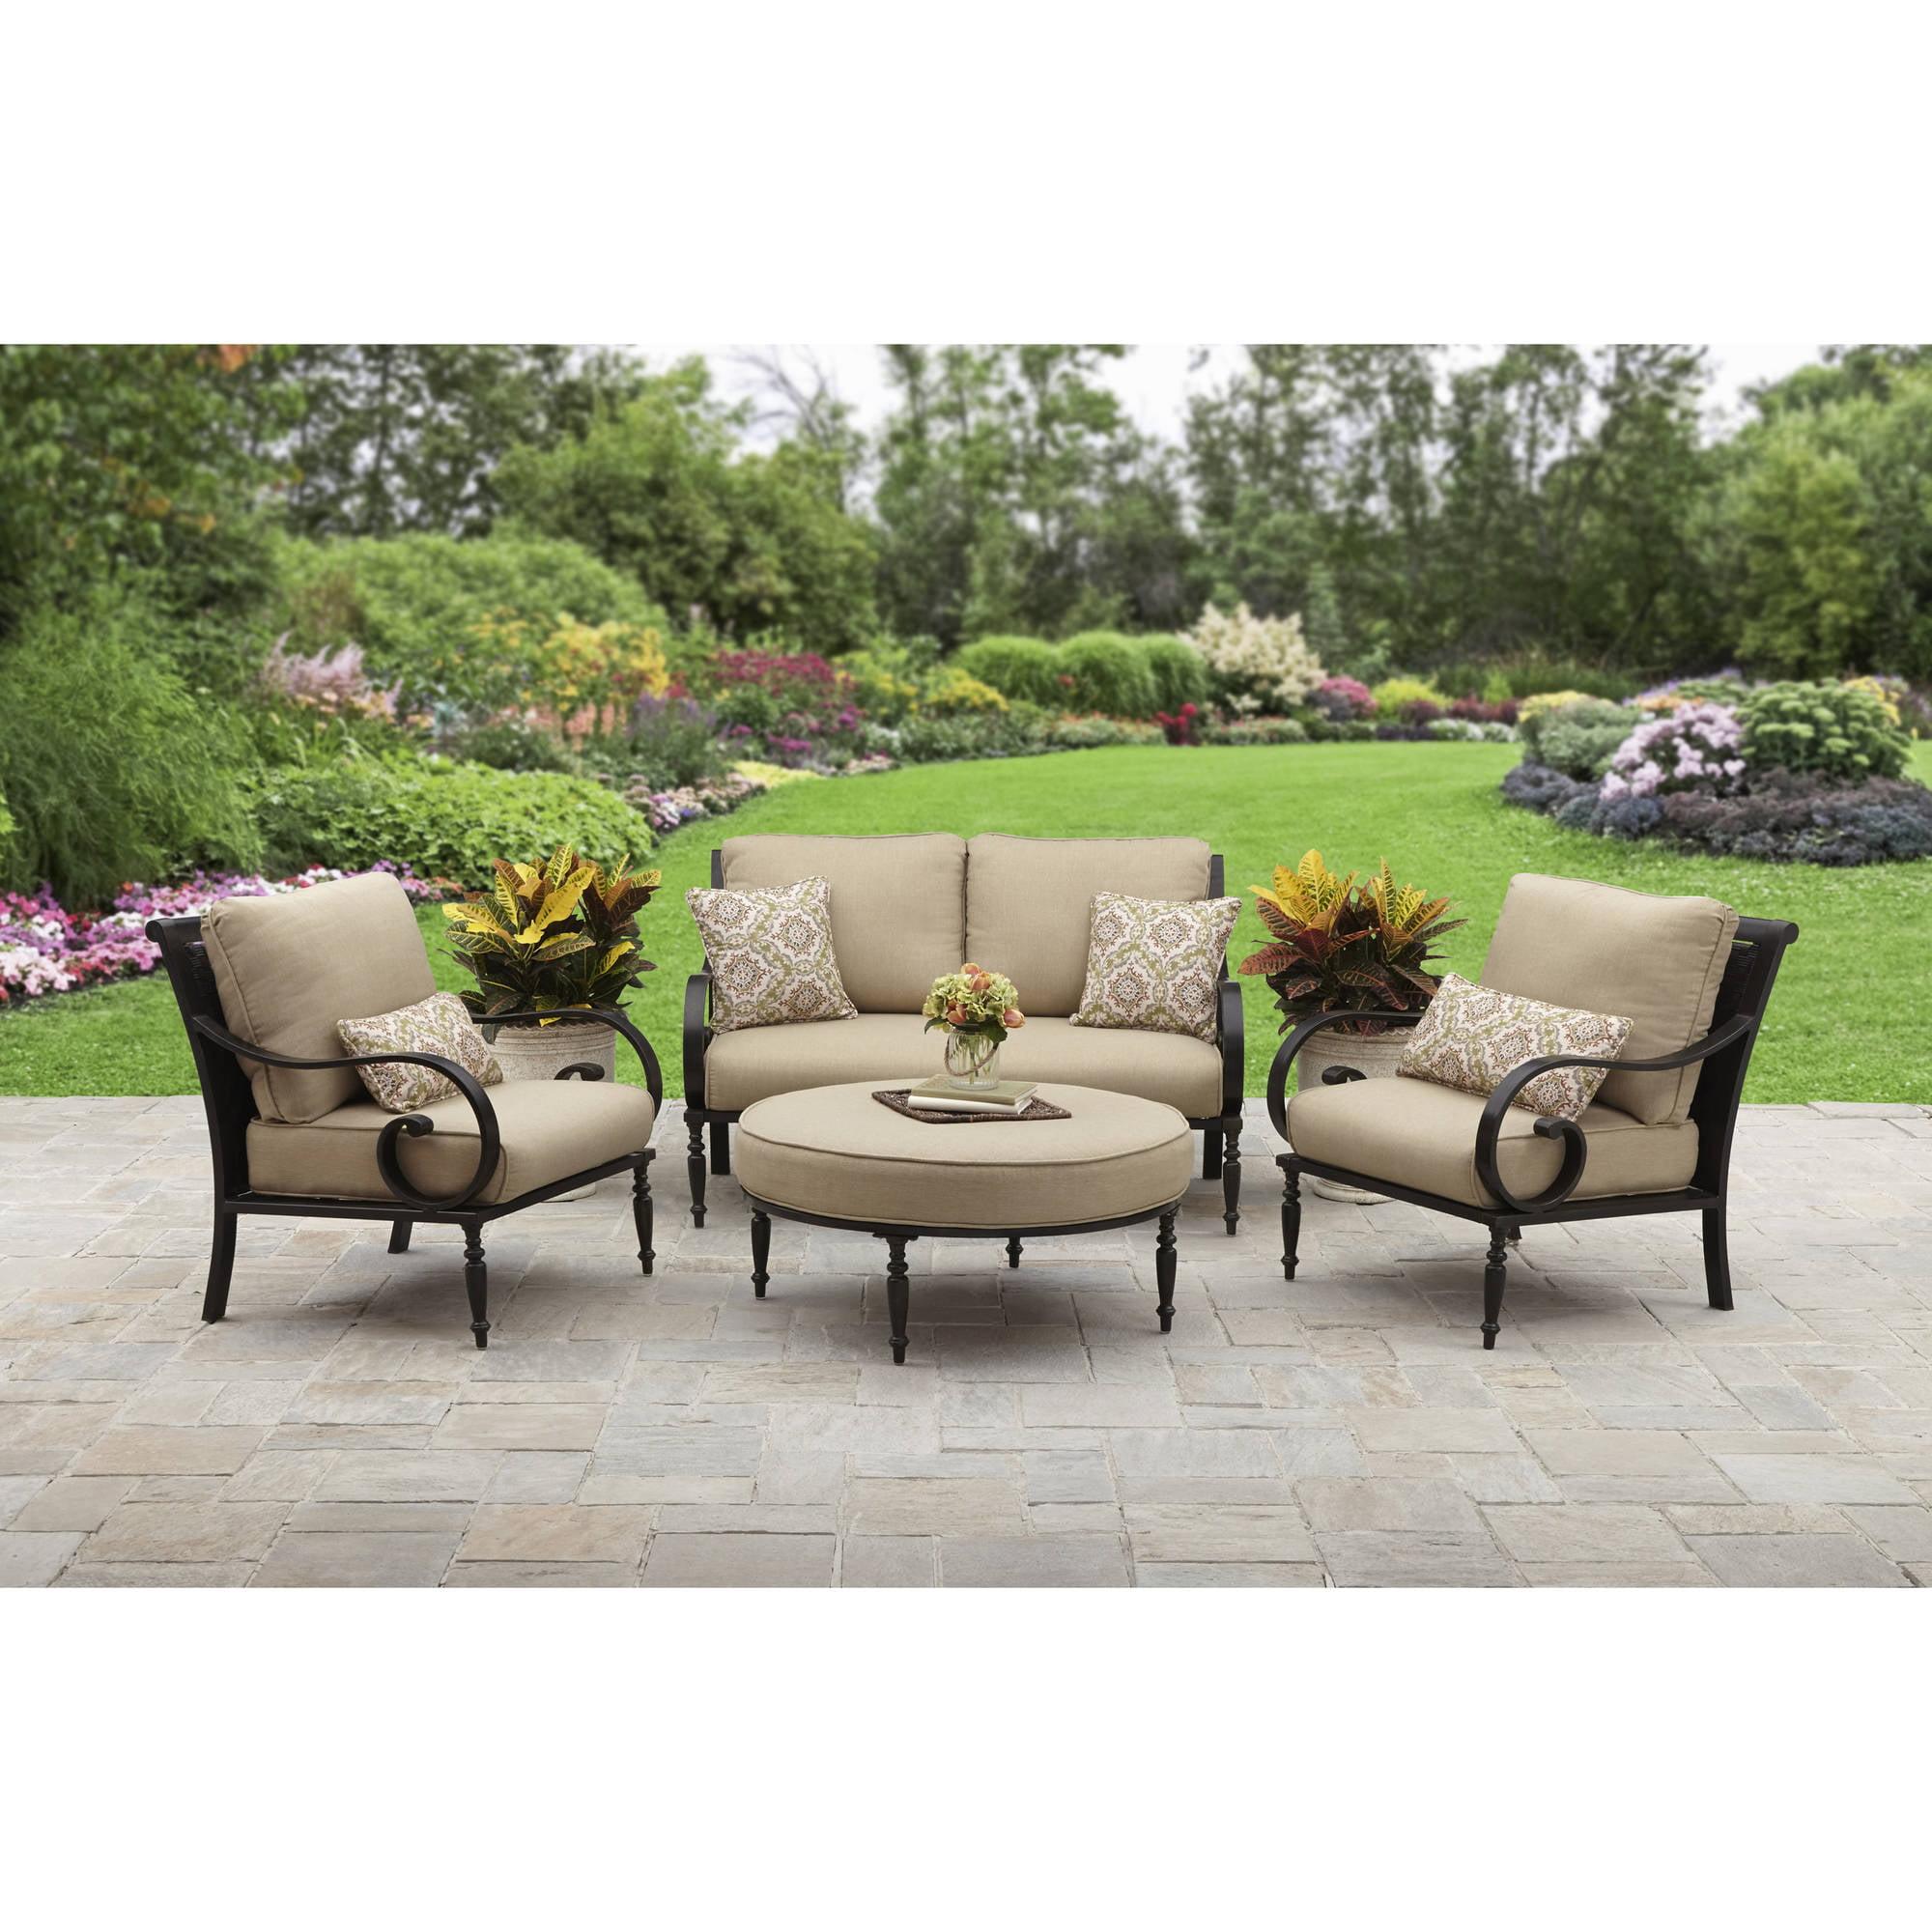 Better Homes and Gardens Englewood Heights II Aluminum 4-piece Outdoor Patio Conversation Set, Seats 4